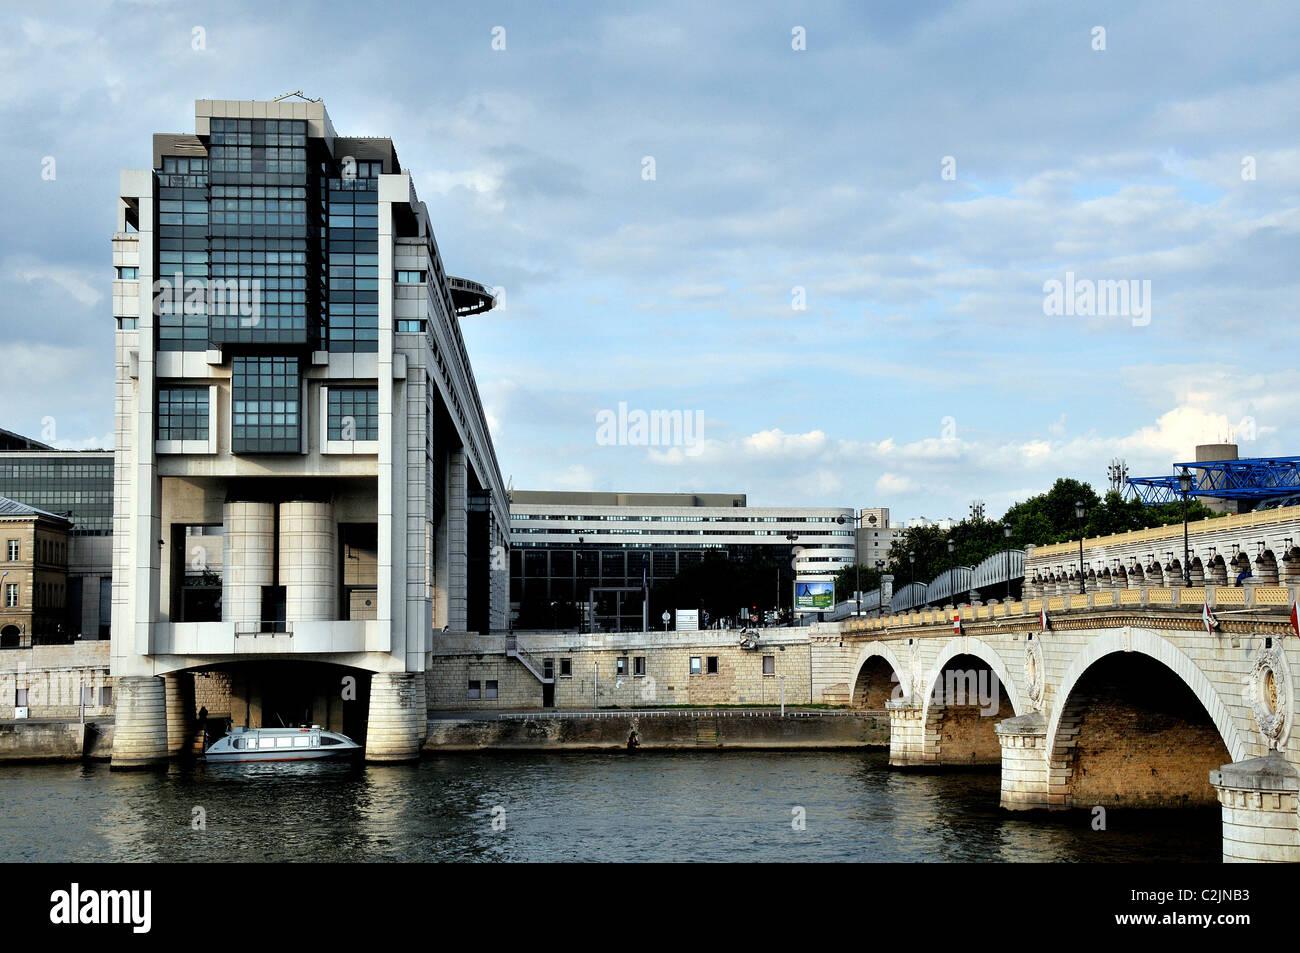 finance ministry Bercy Paris France - Stock Image